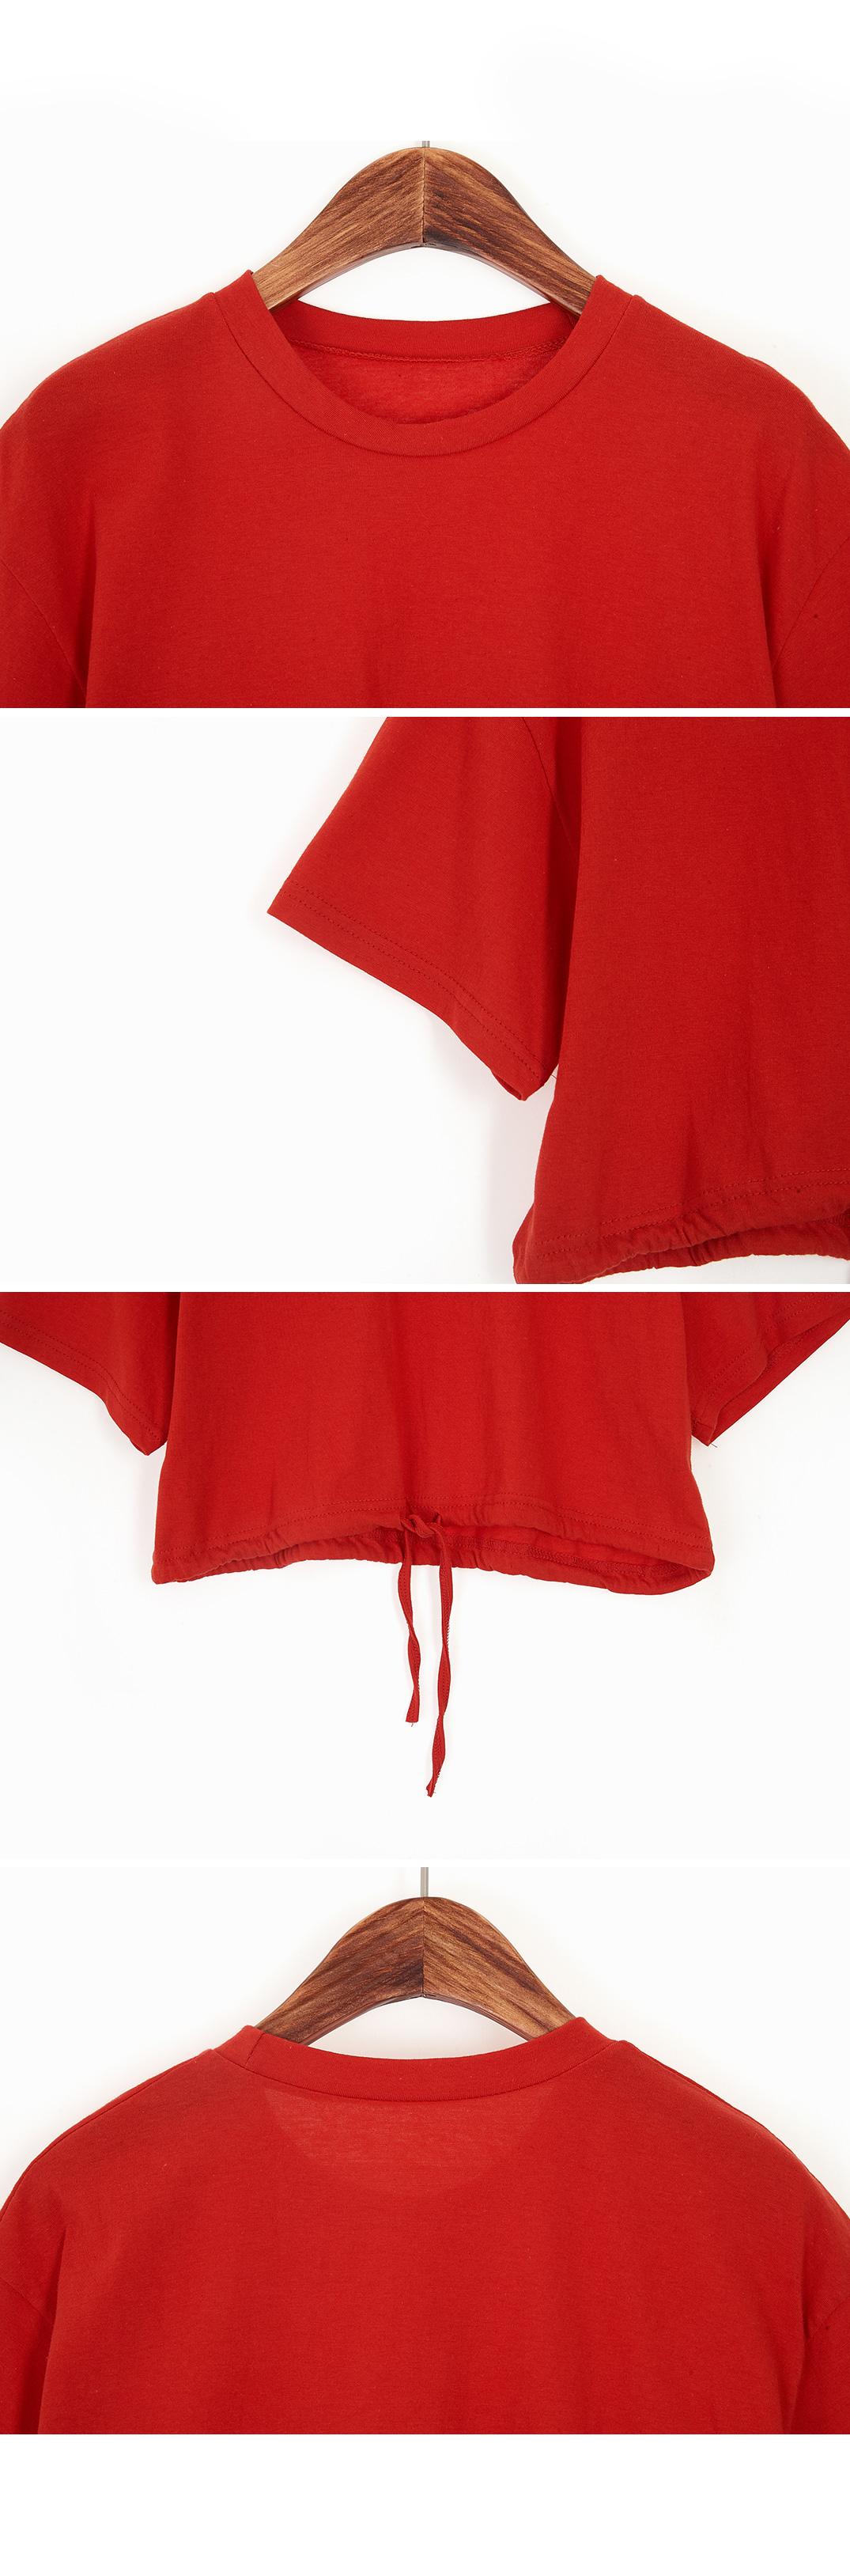 String crop t-shirt